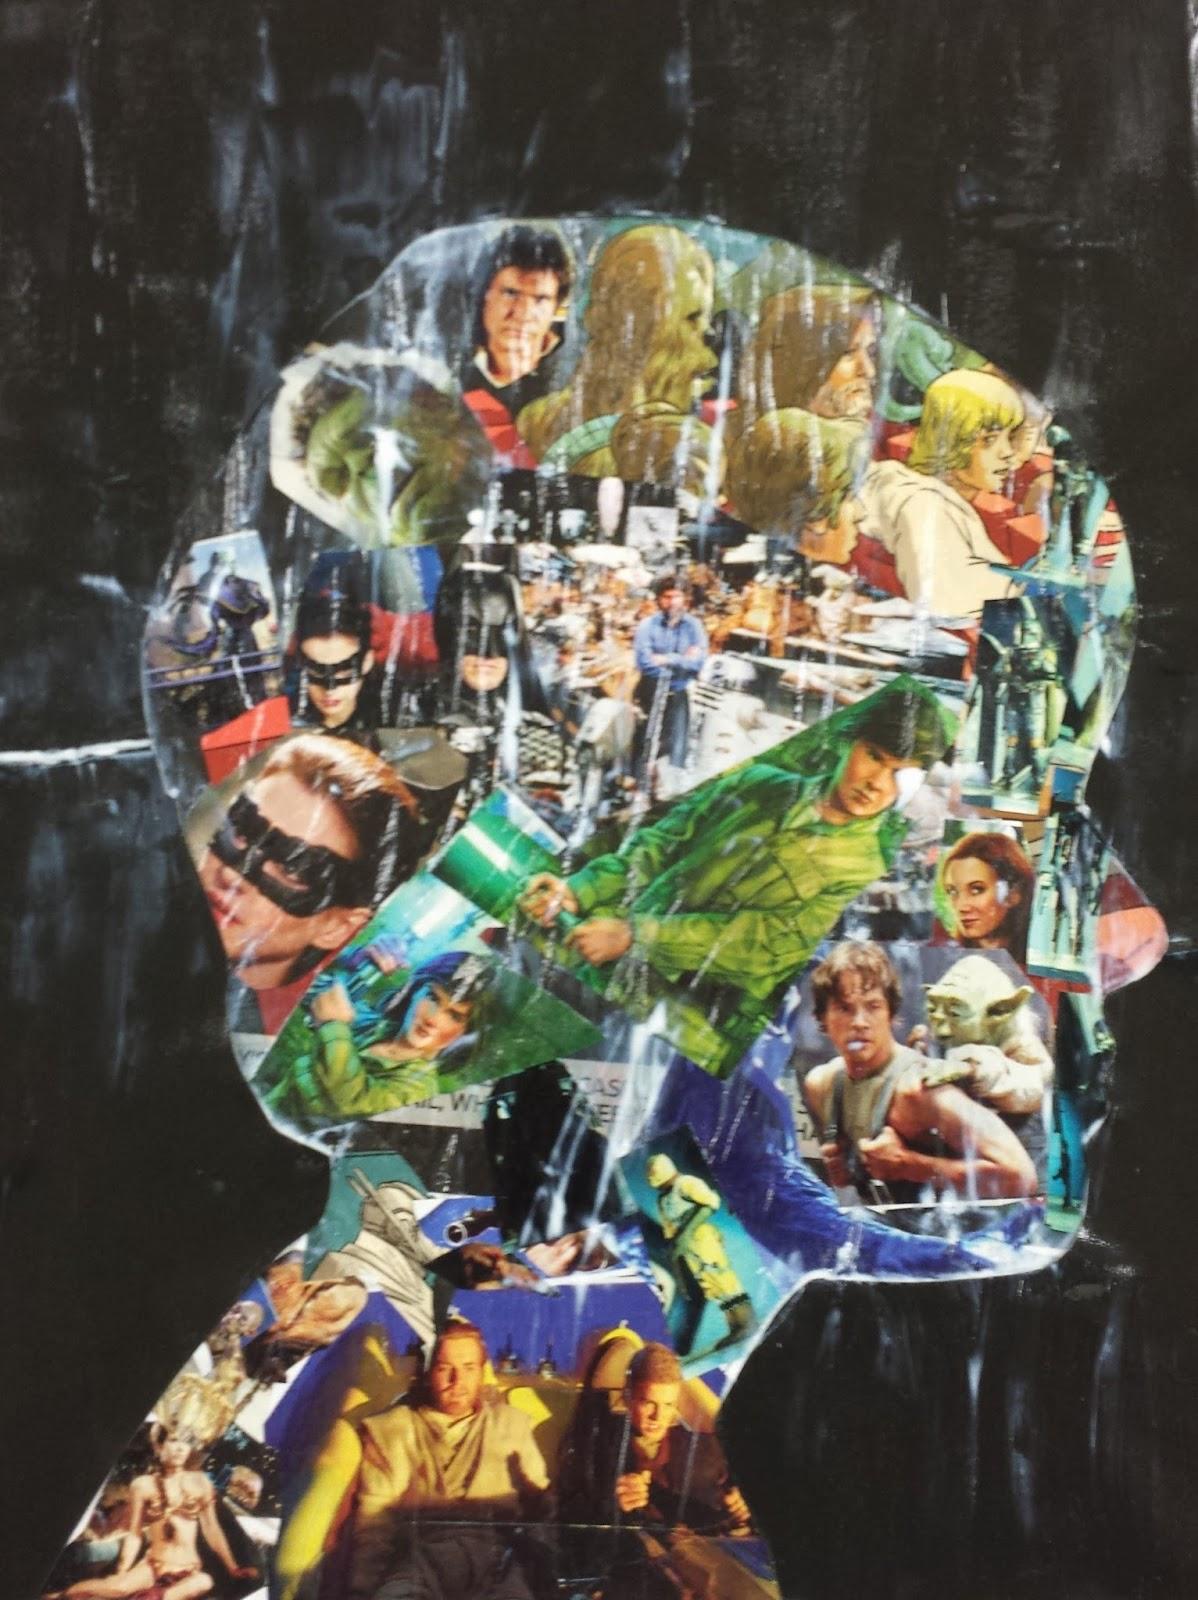 Angela Anderson Art Blog: Profile Silhouette Collage ...